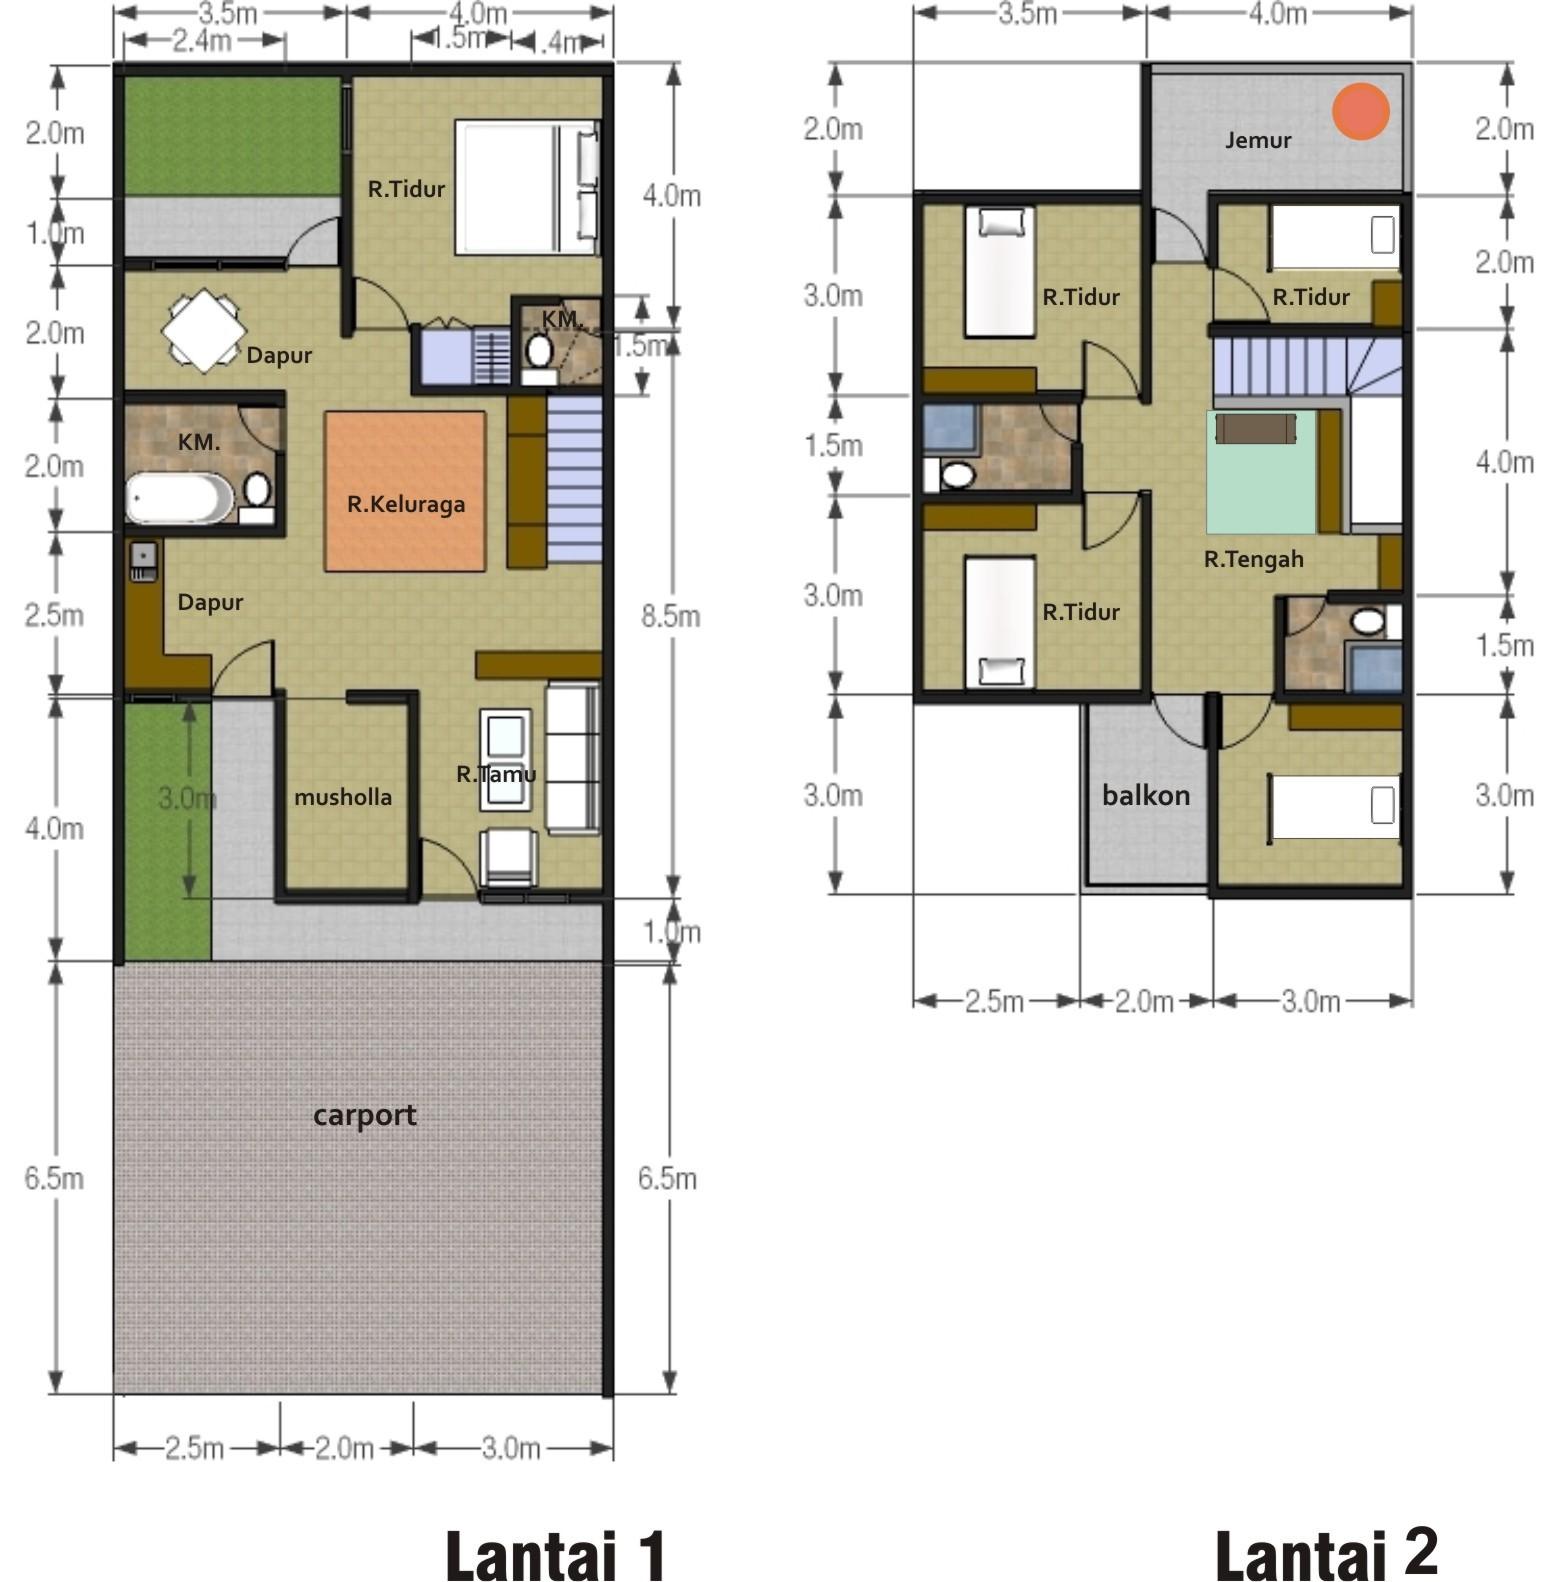 107 Gambar Rumah Sewa Minimalis Sederhana Gambar Desain Rumah